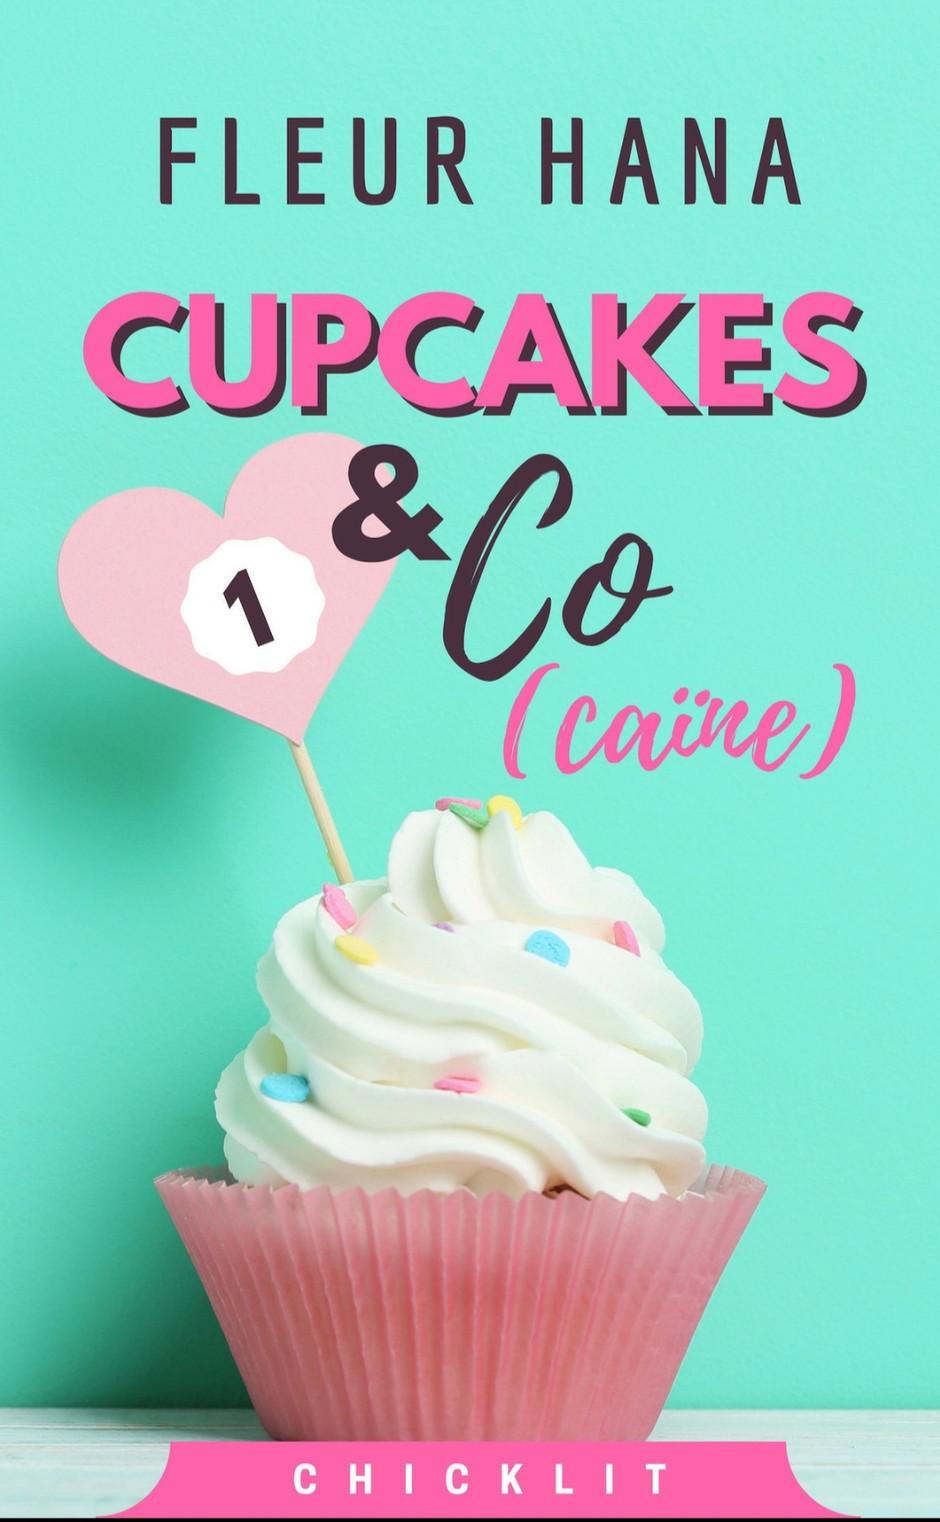 Chronique de Cupcakes ans co de Fleur Hana